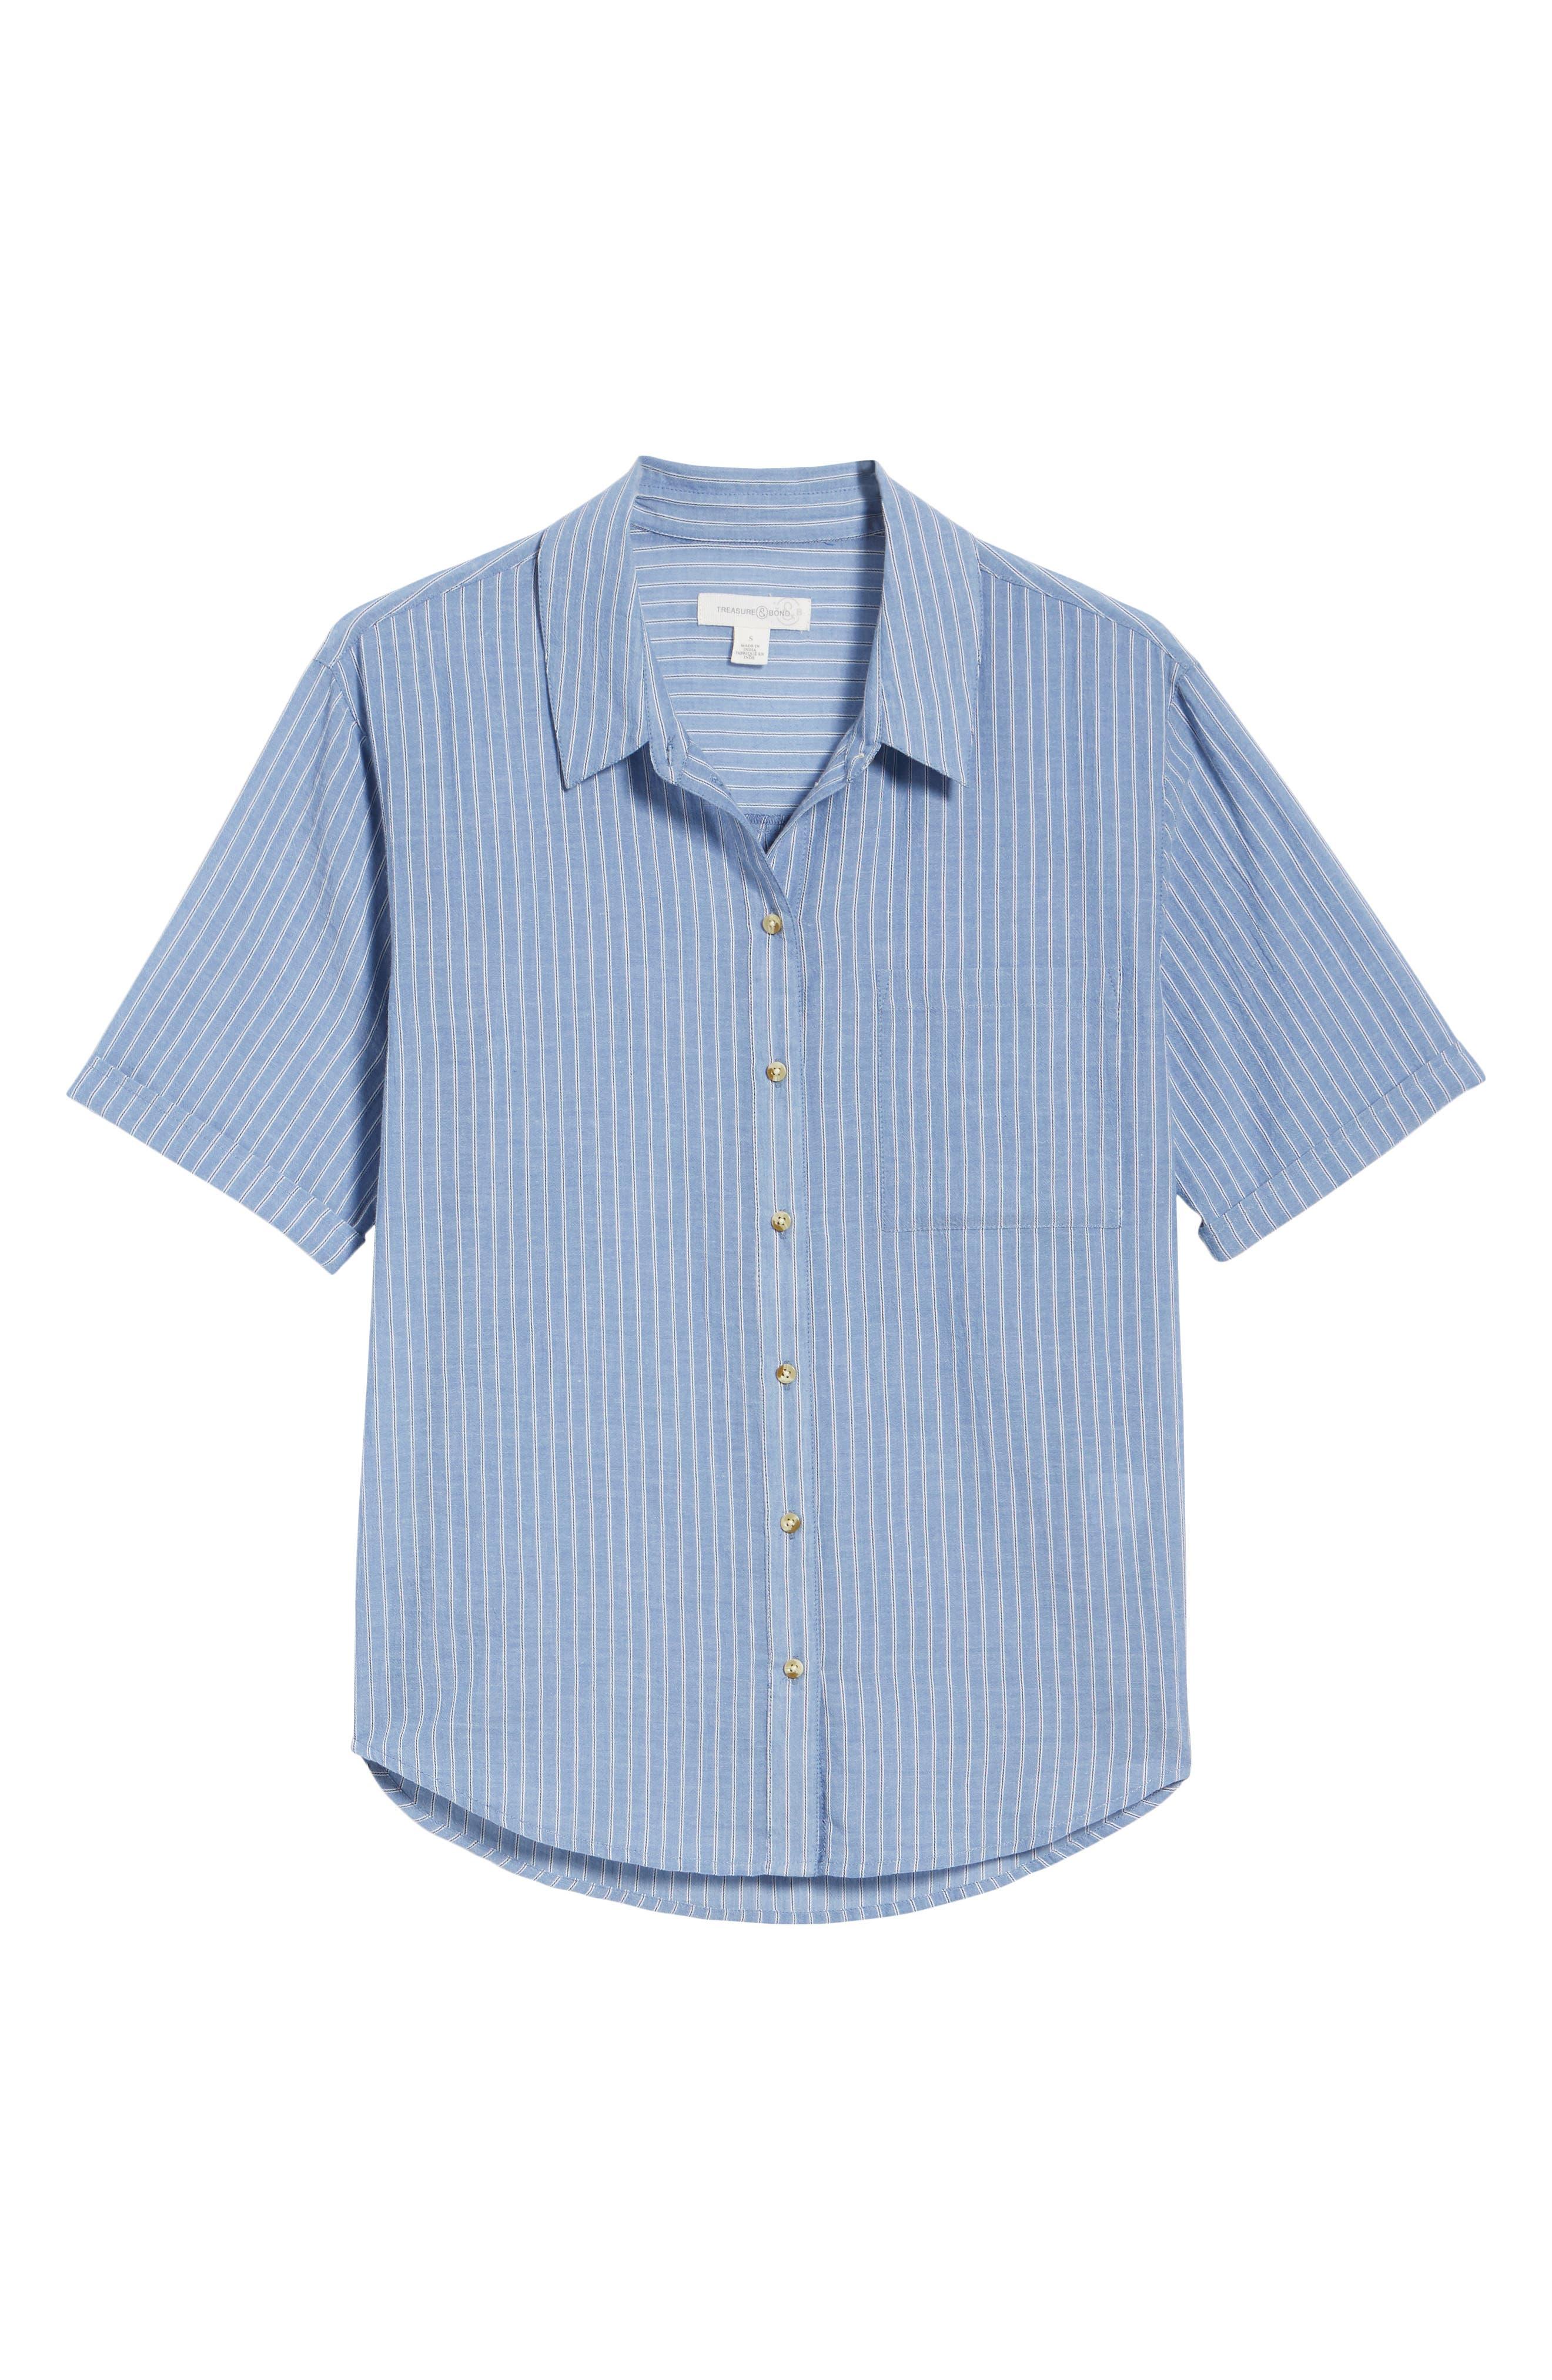 Stripe Button Front Shirt,                             Alternate thumbnail 6, color,                             BLUE AIRY STRIPE